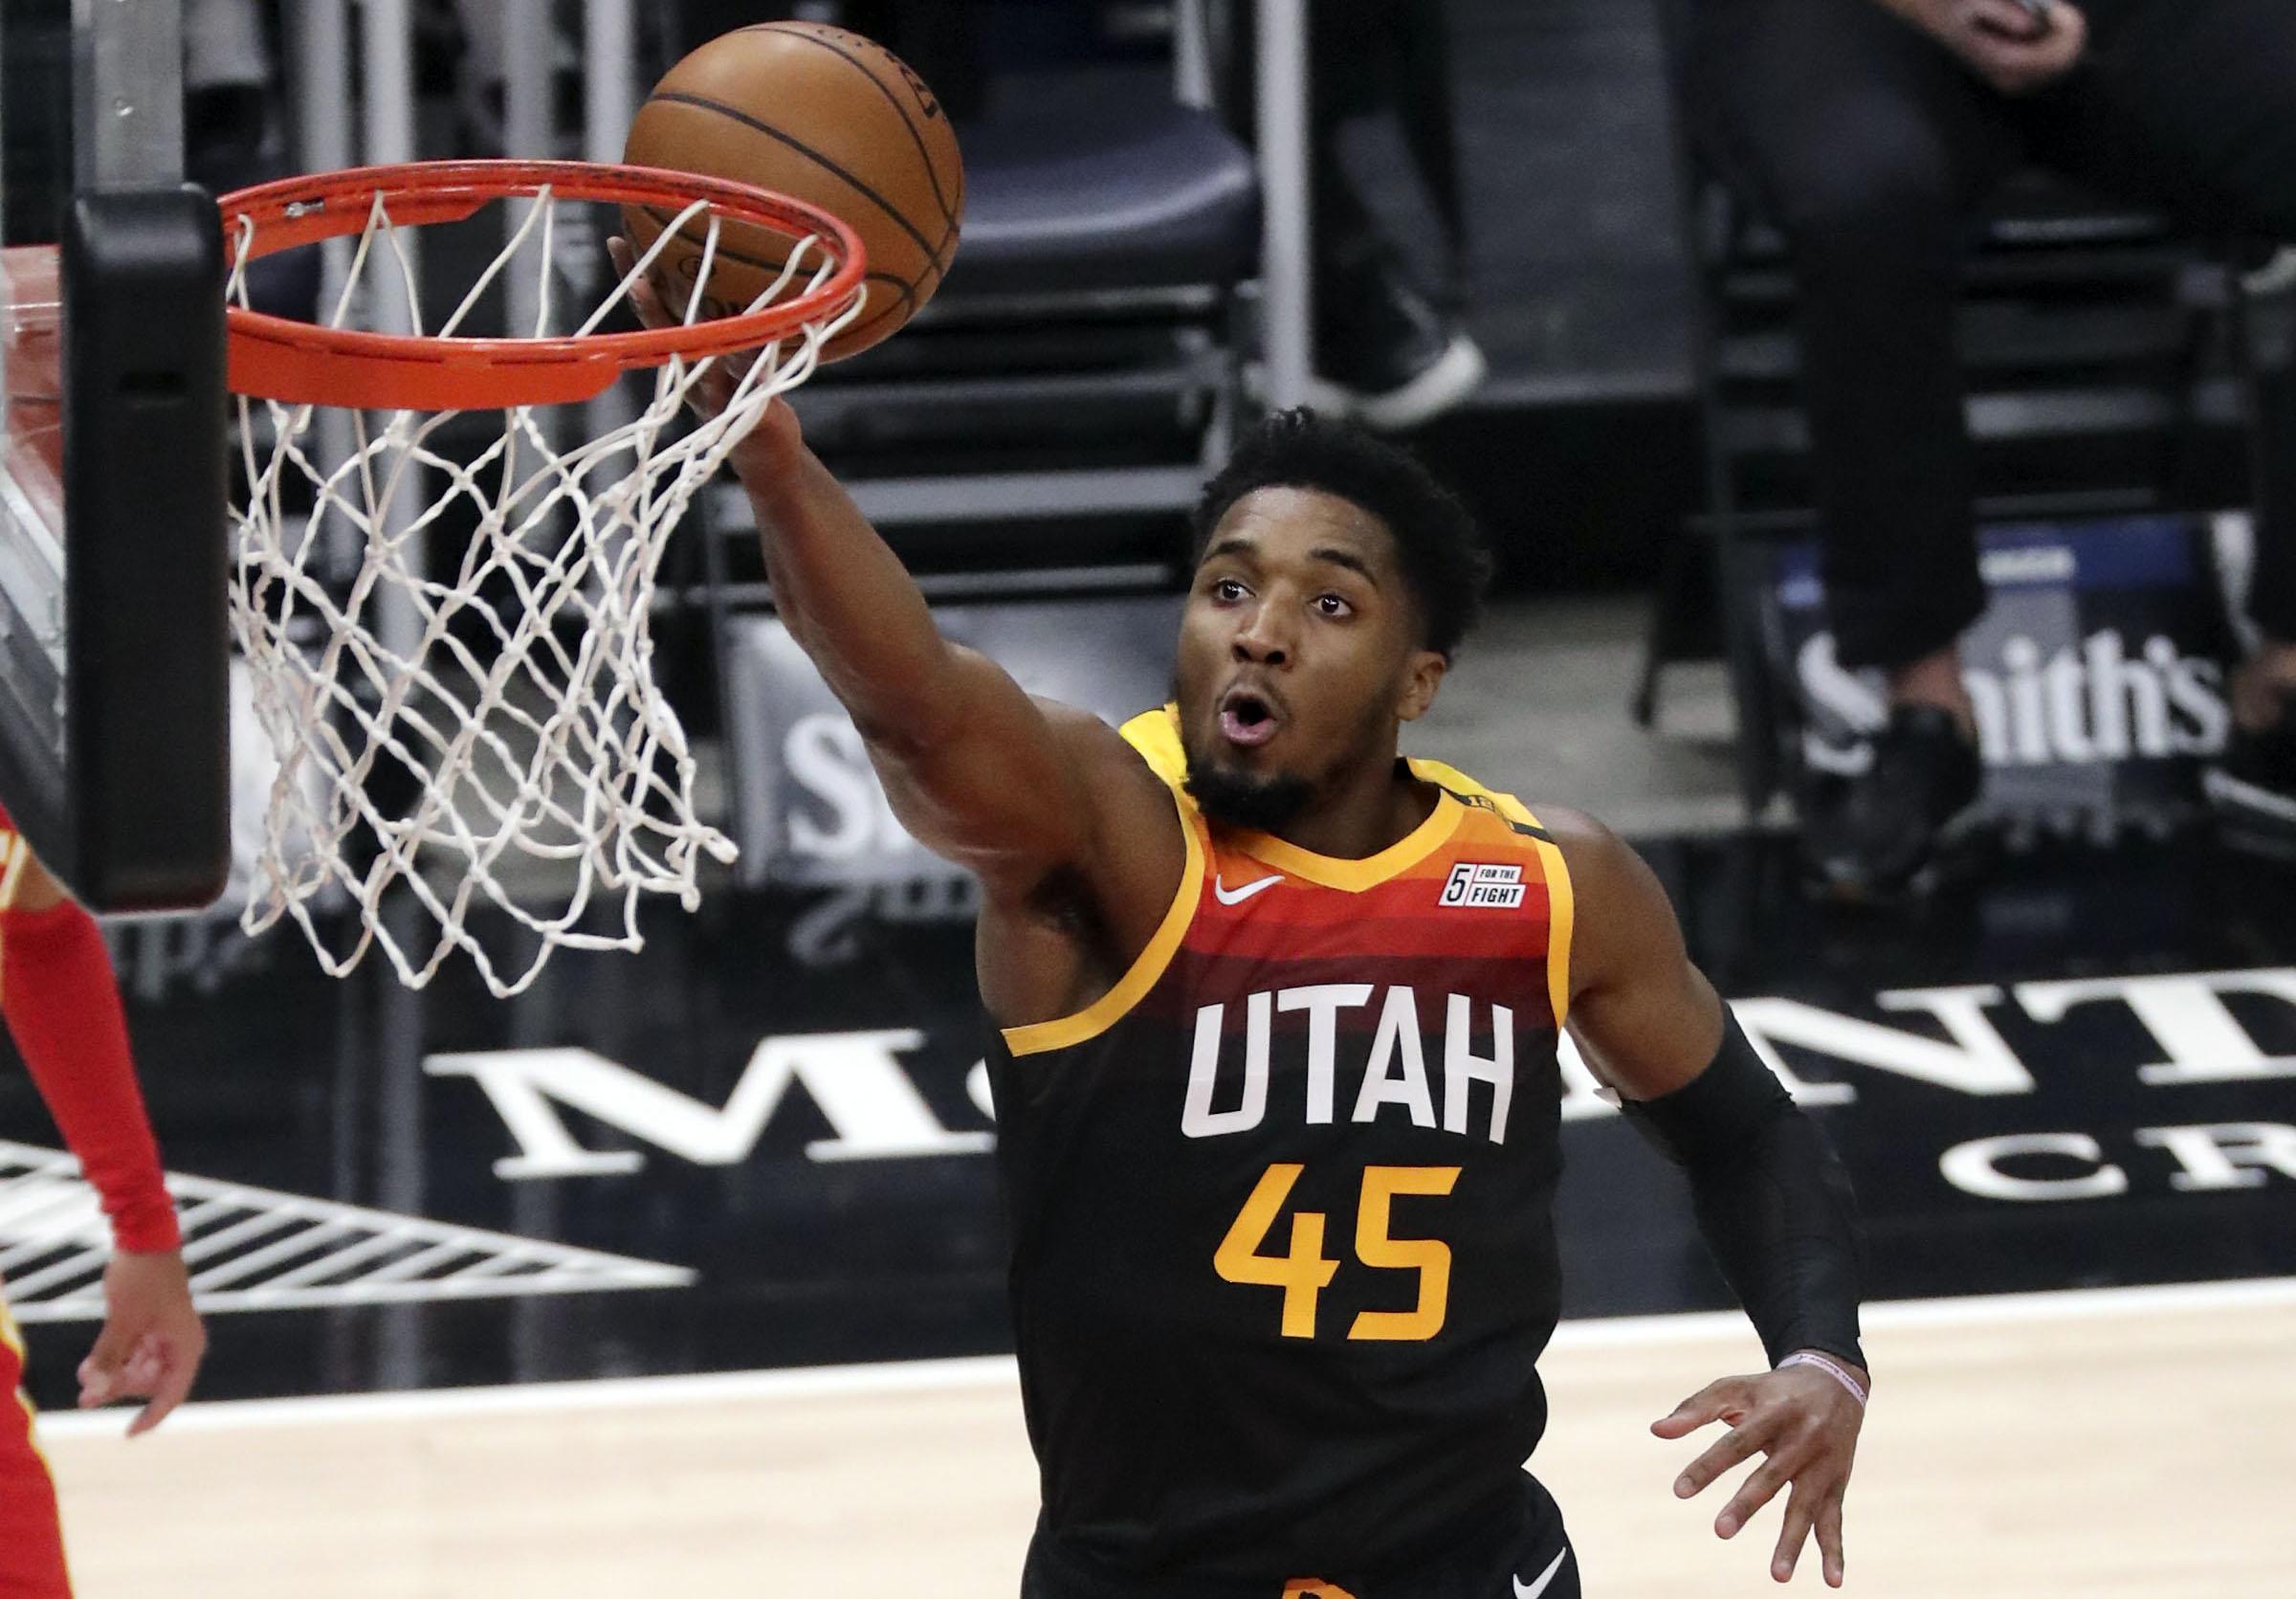 Utah Jazz guard Donovan Mitchell (45) shoots during an NBA game against the Atlanta Hawks at Vivint Smart Home Arena in Salt Lake City on Friday, Jan. 15, 2021.